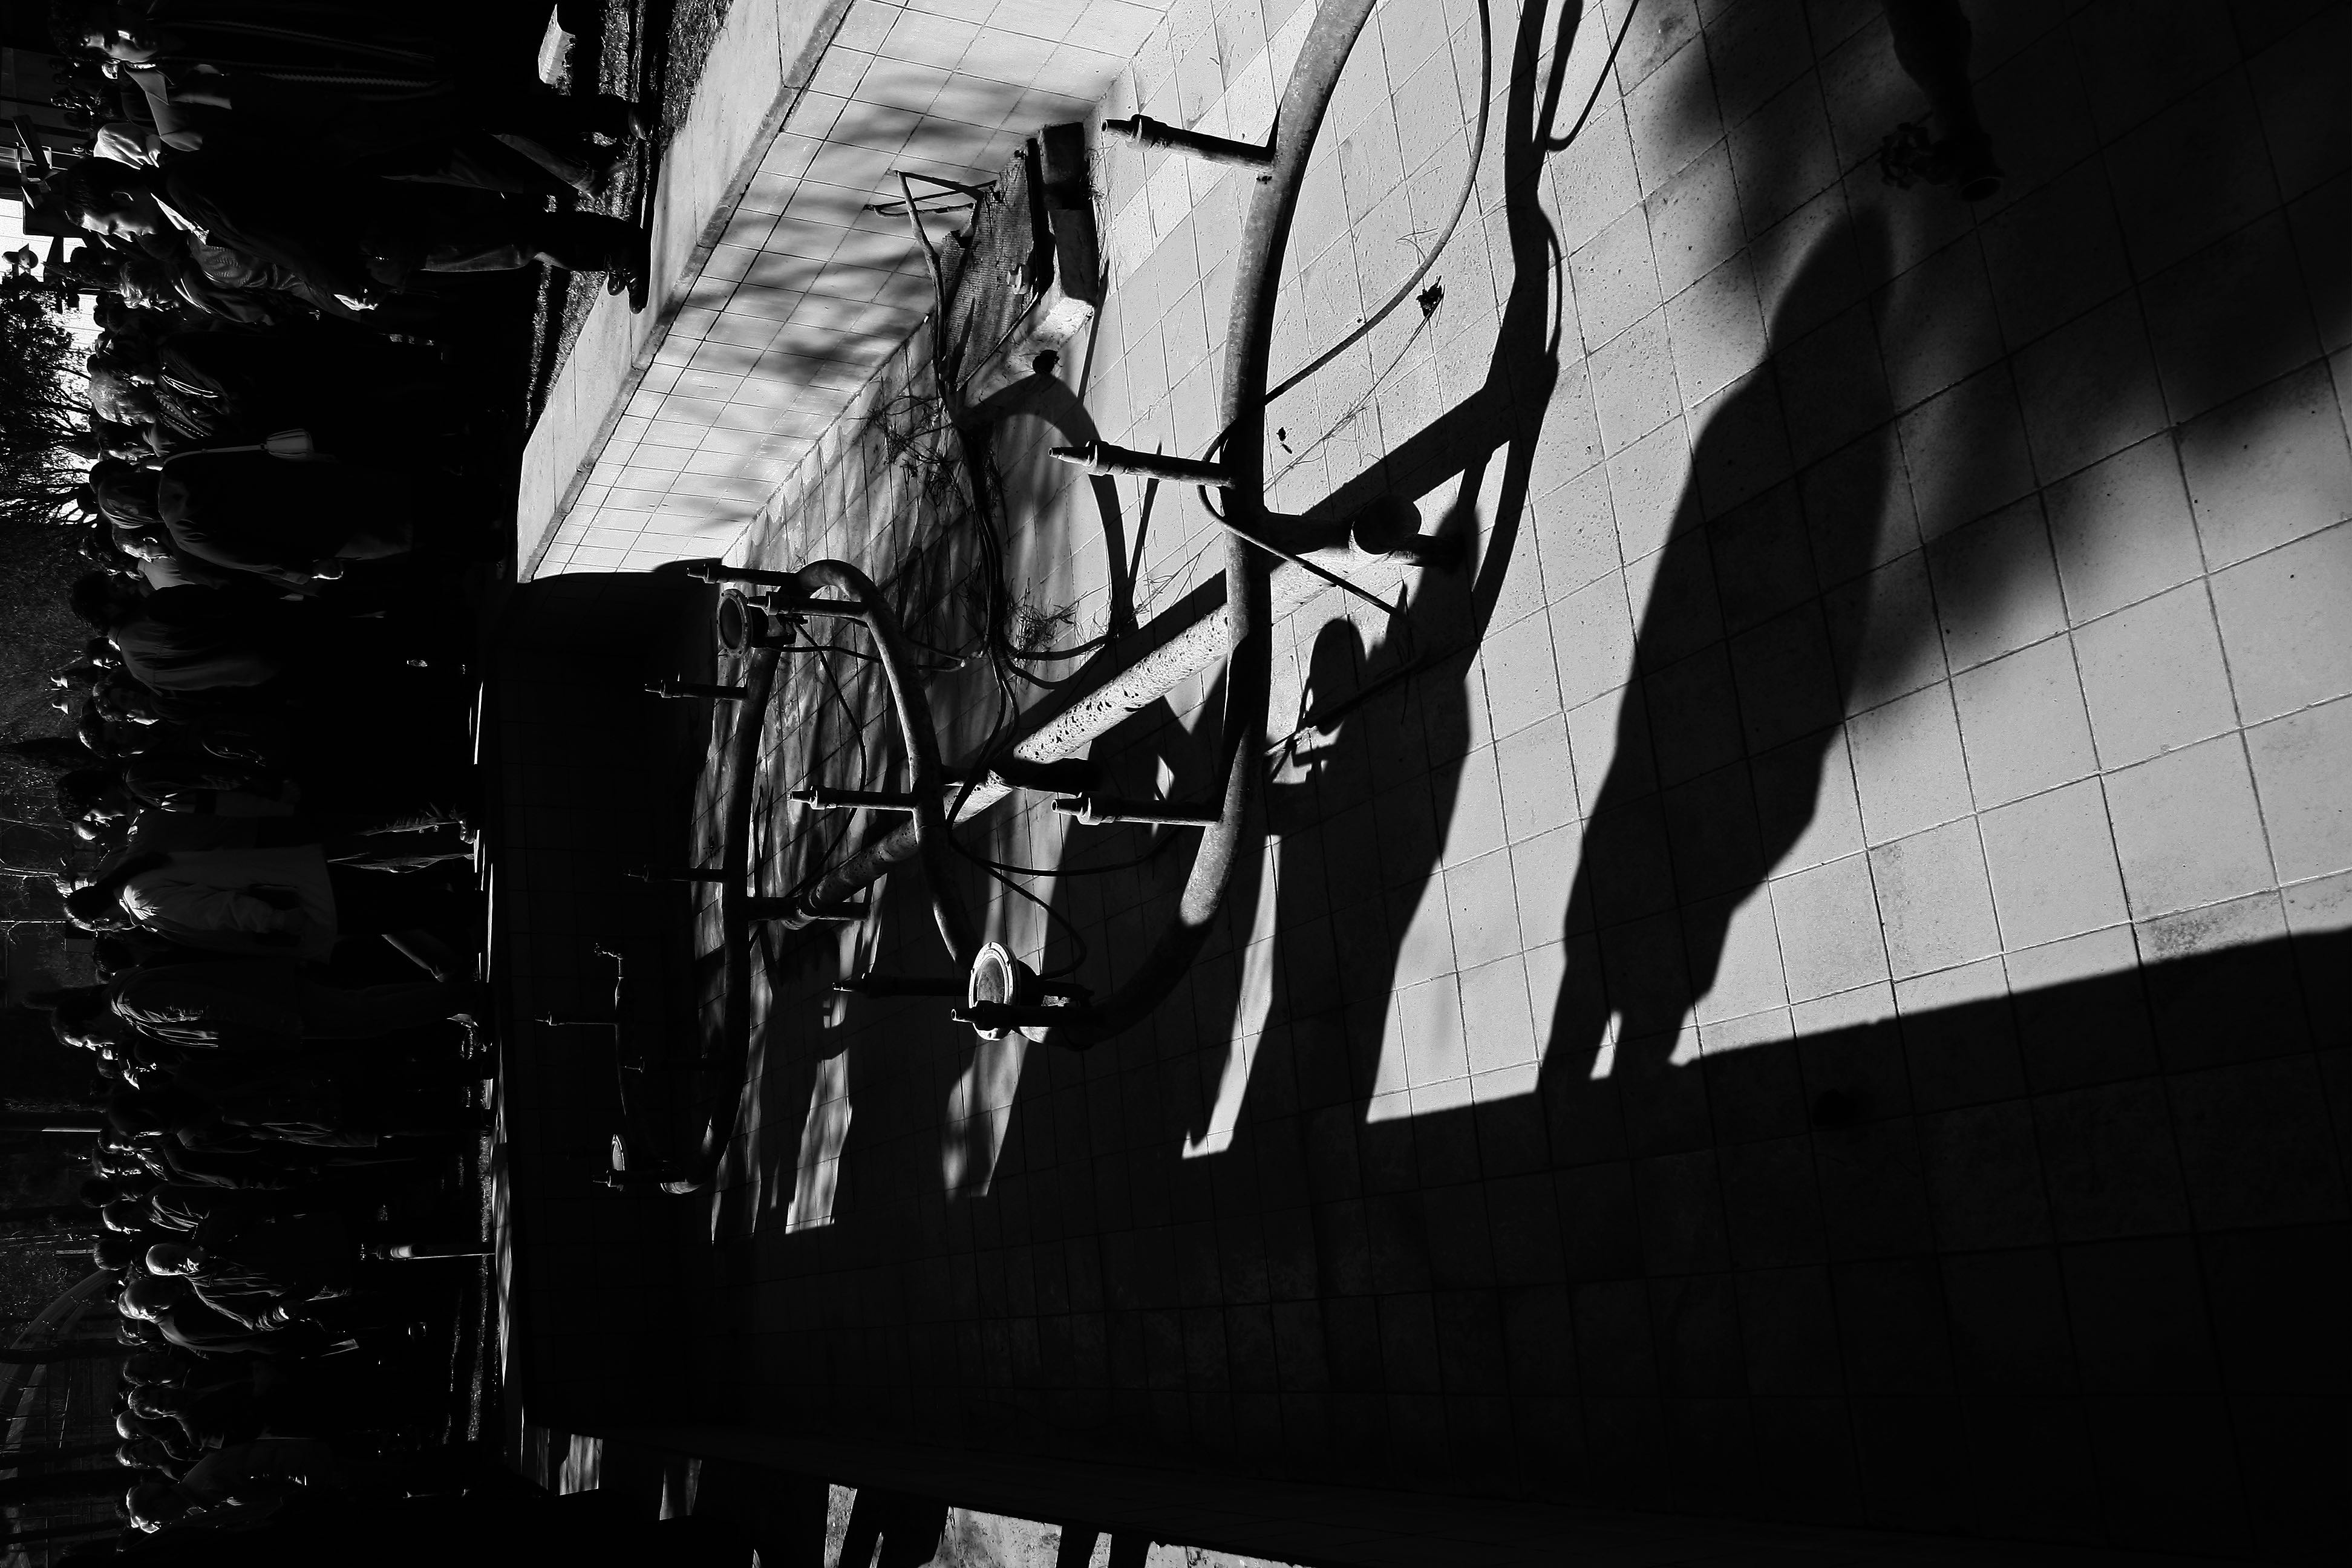 Untitled (10)_ The Life Of Shadows Series - Nehdaran_ Dana